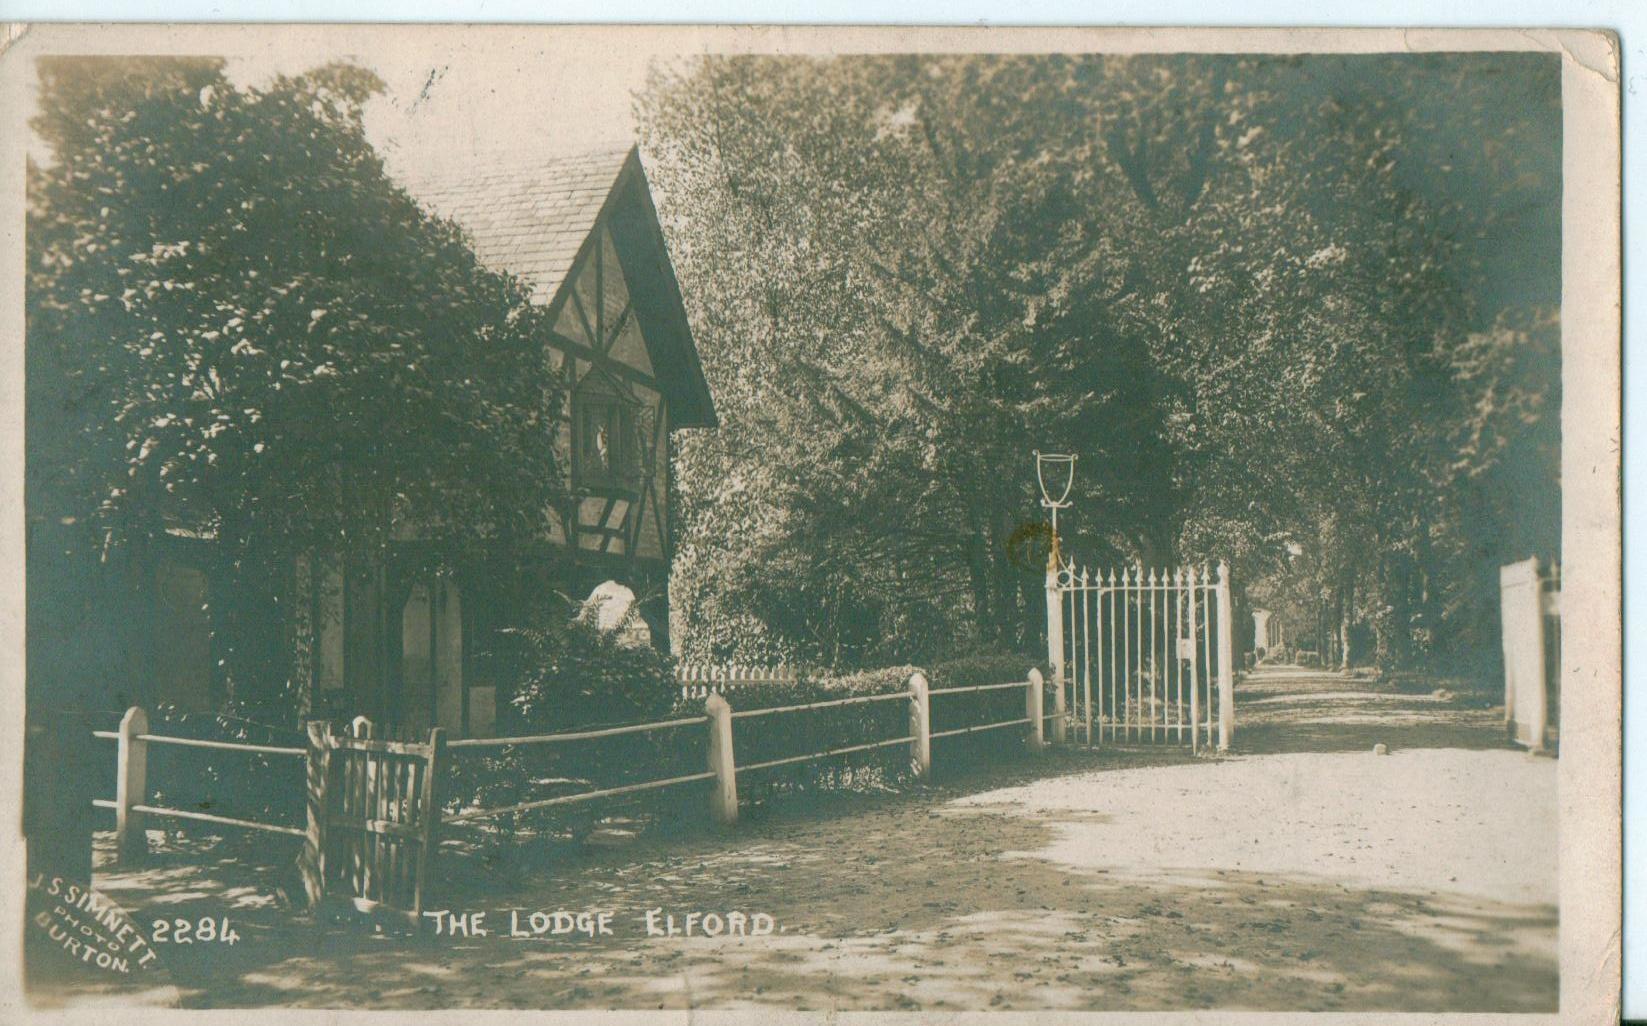 The Lodge Elford